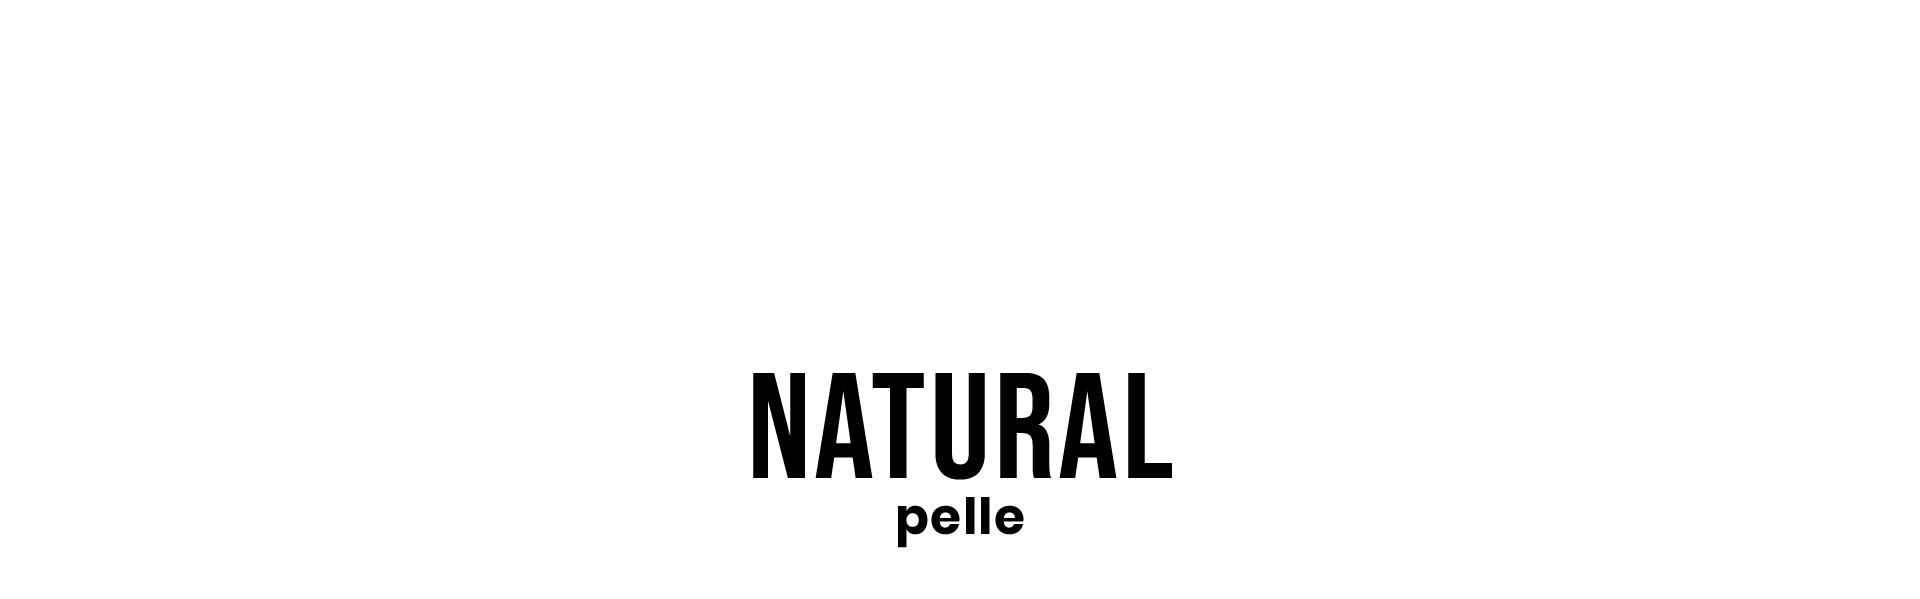 natural - Copia